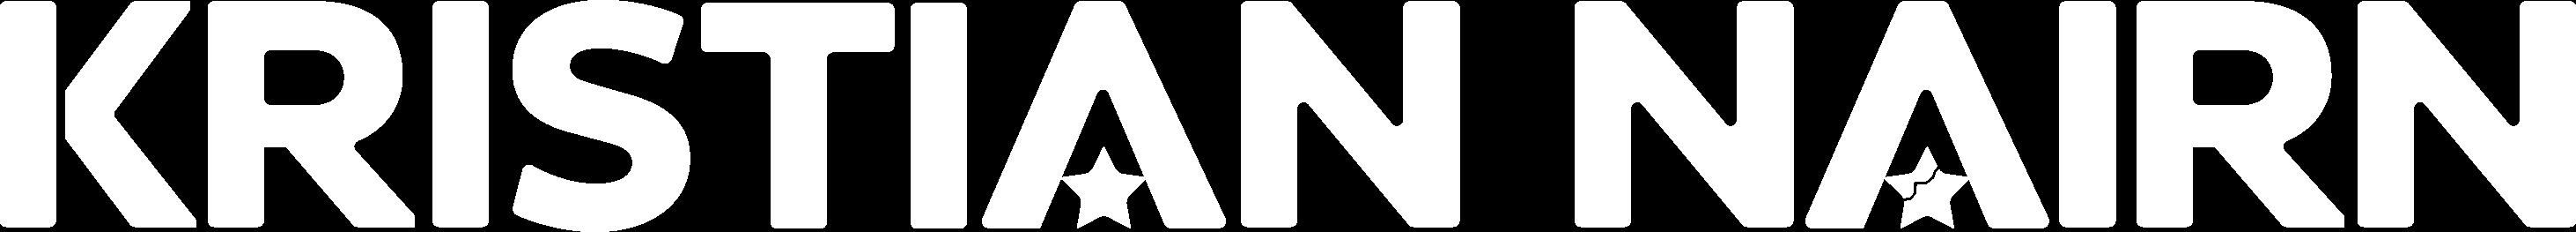 Kristian Nairn - DJ | Producer | Actor